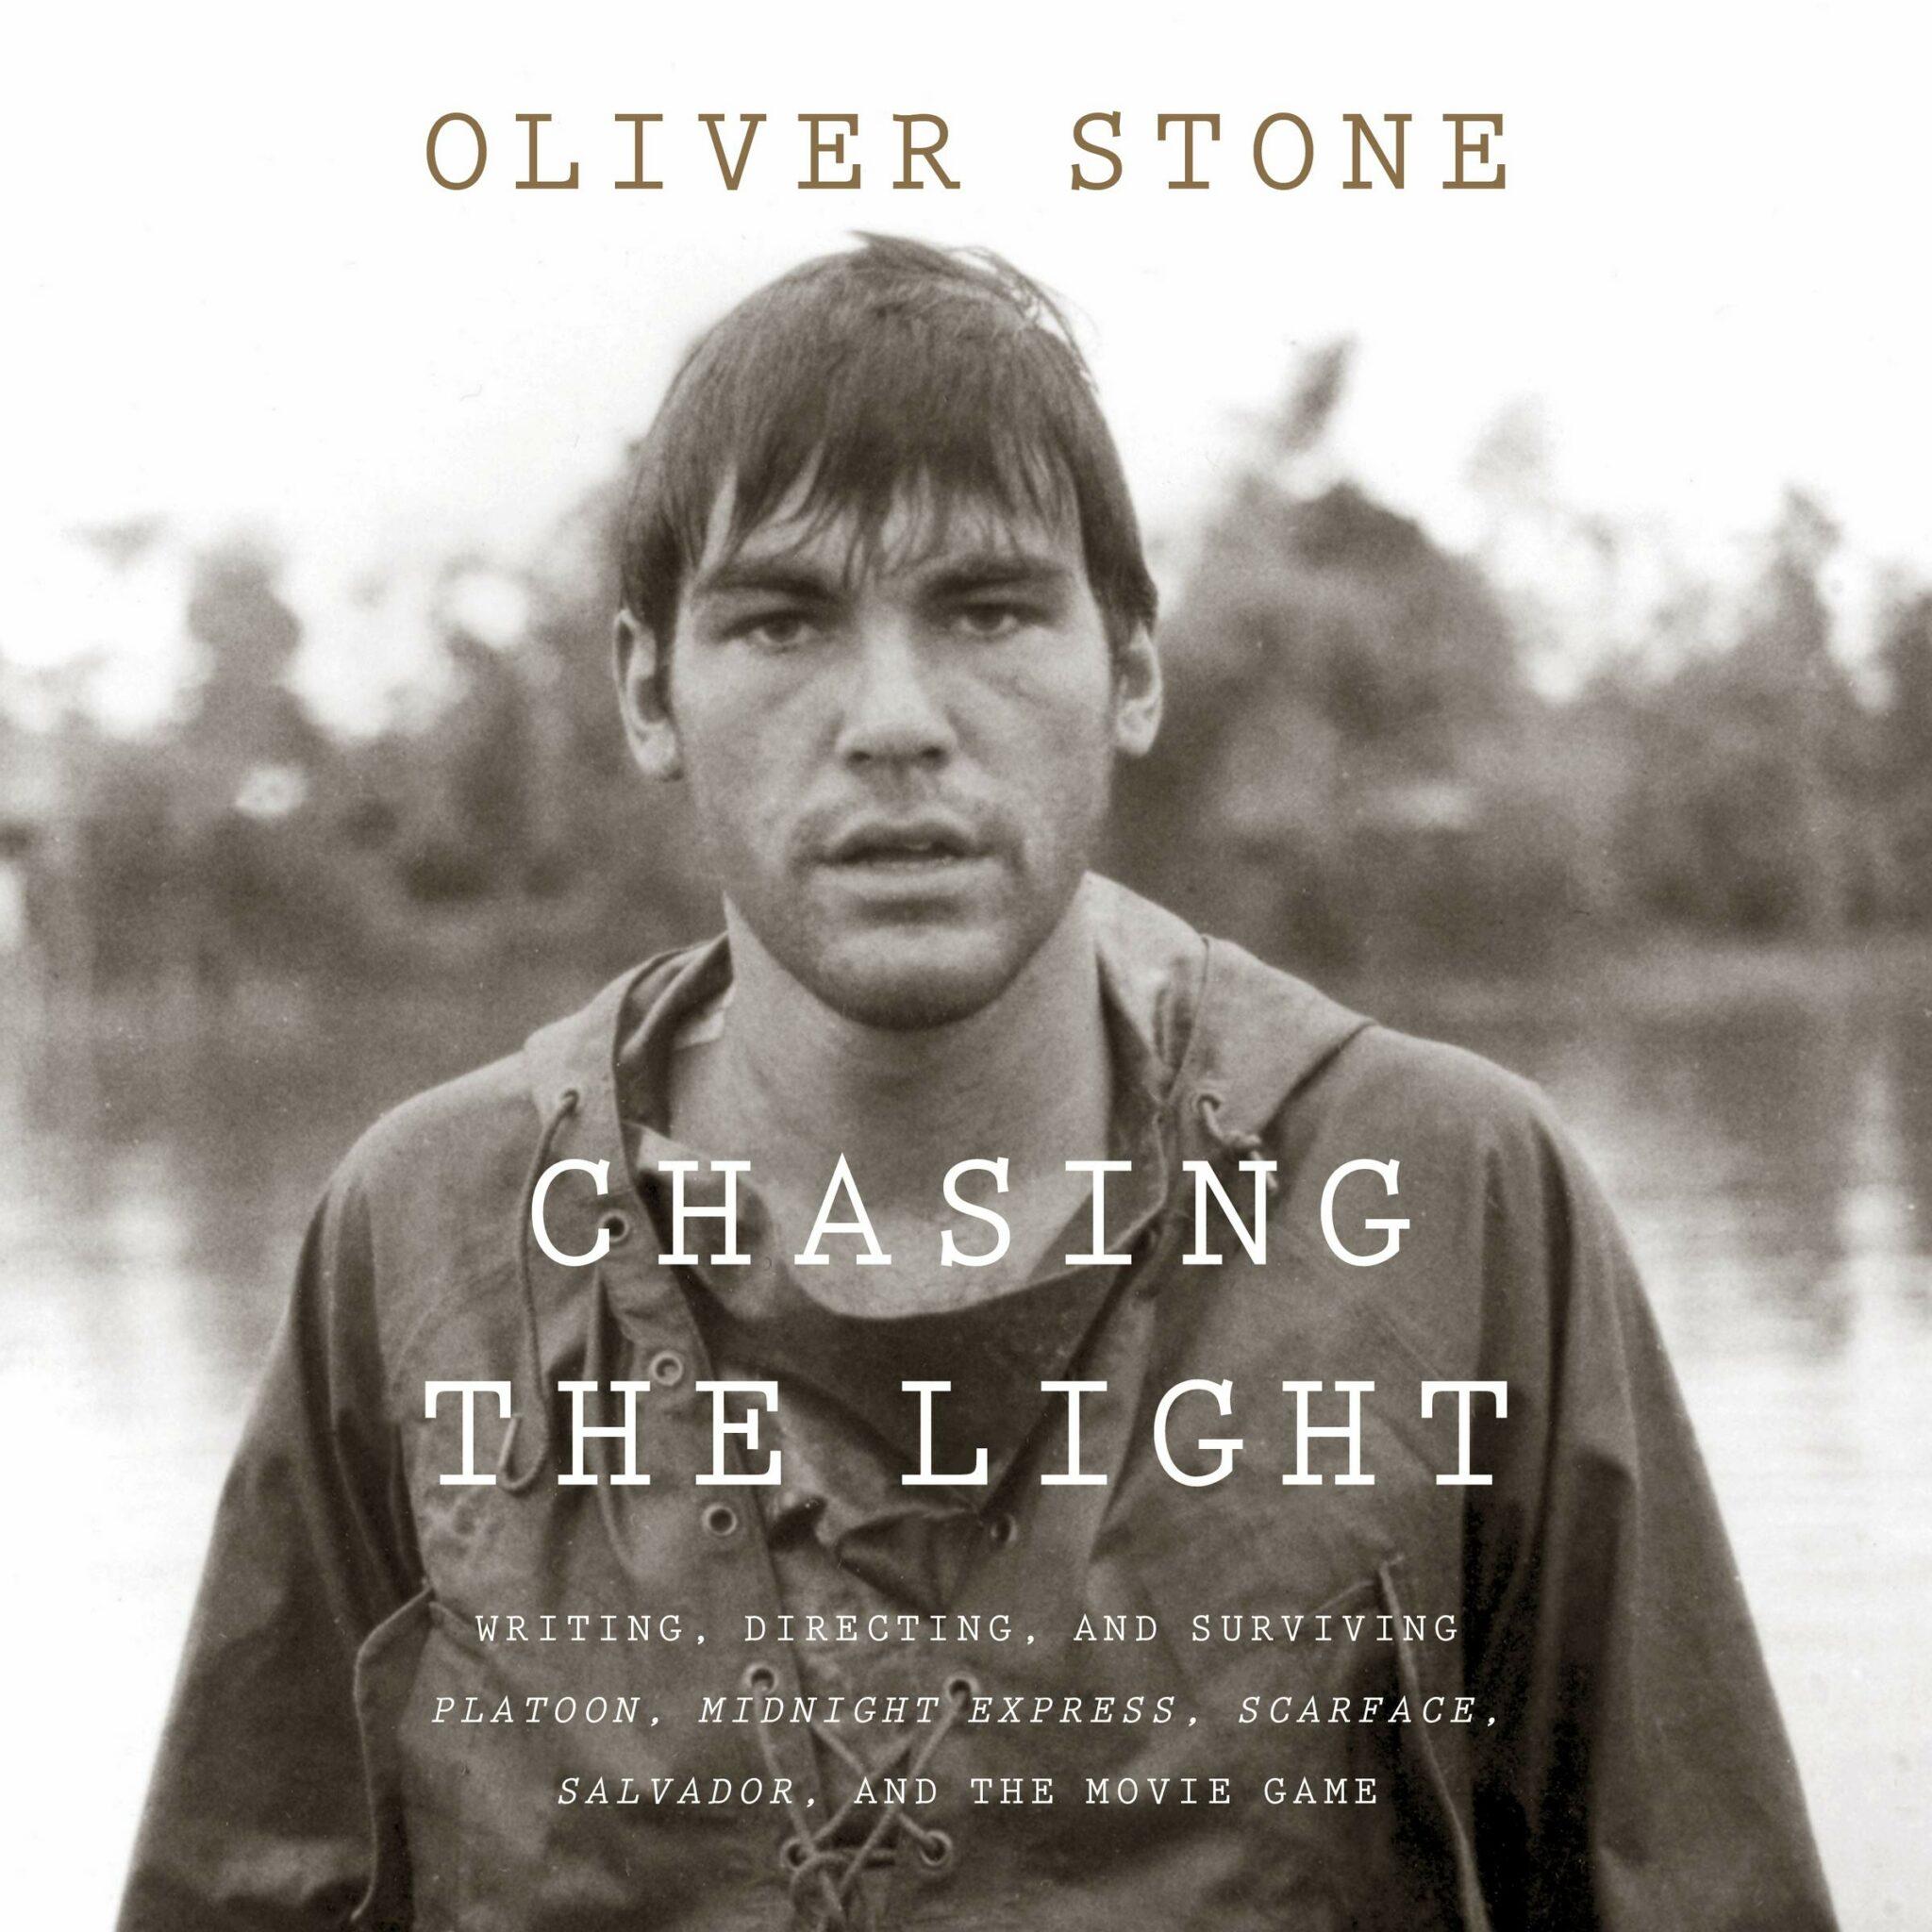 Oliver Stone' Chasing the Light - thescriptblog.com